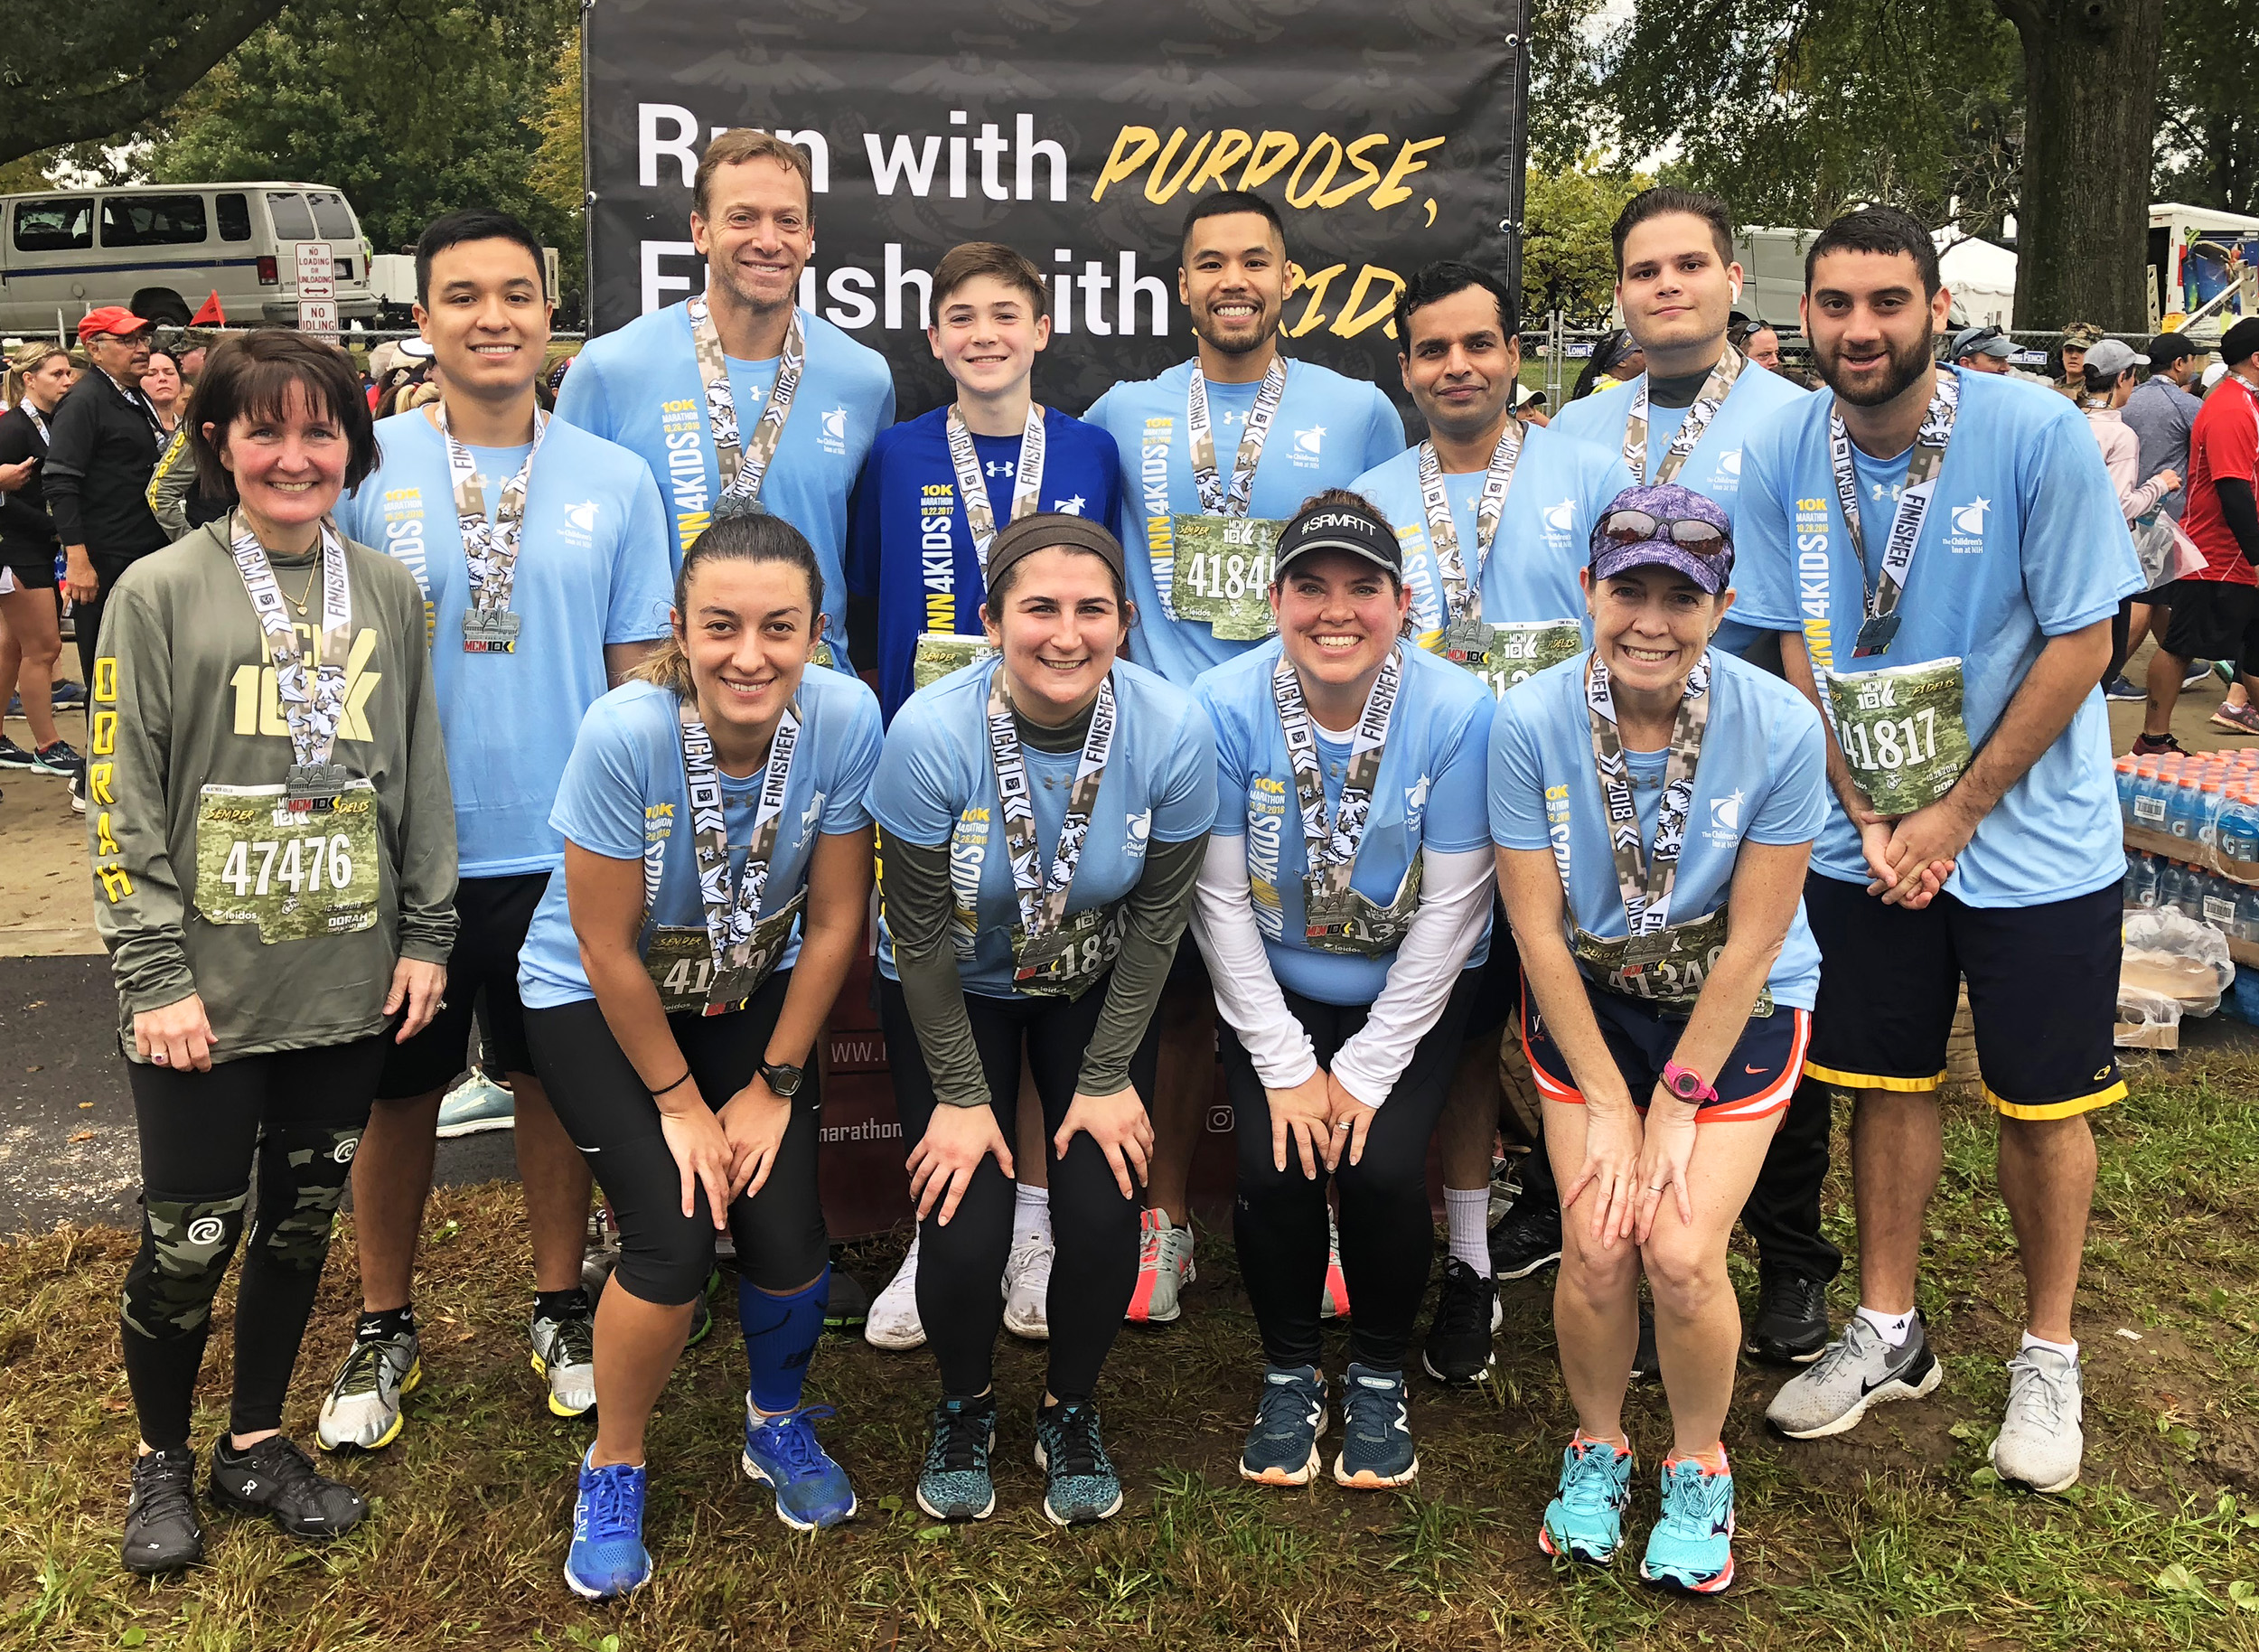 Marine Corps group of runners 10K team